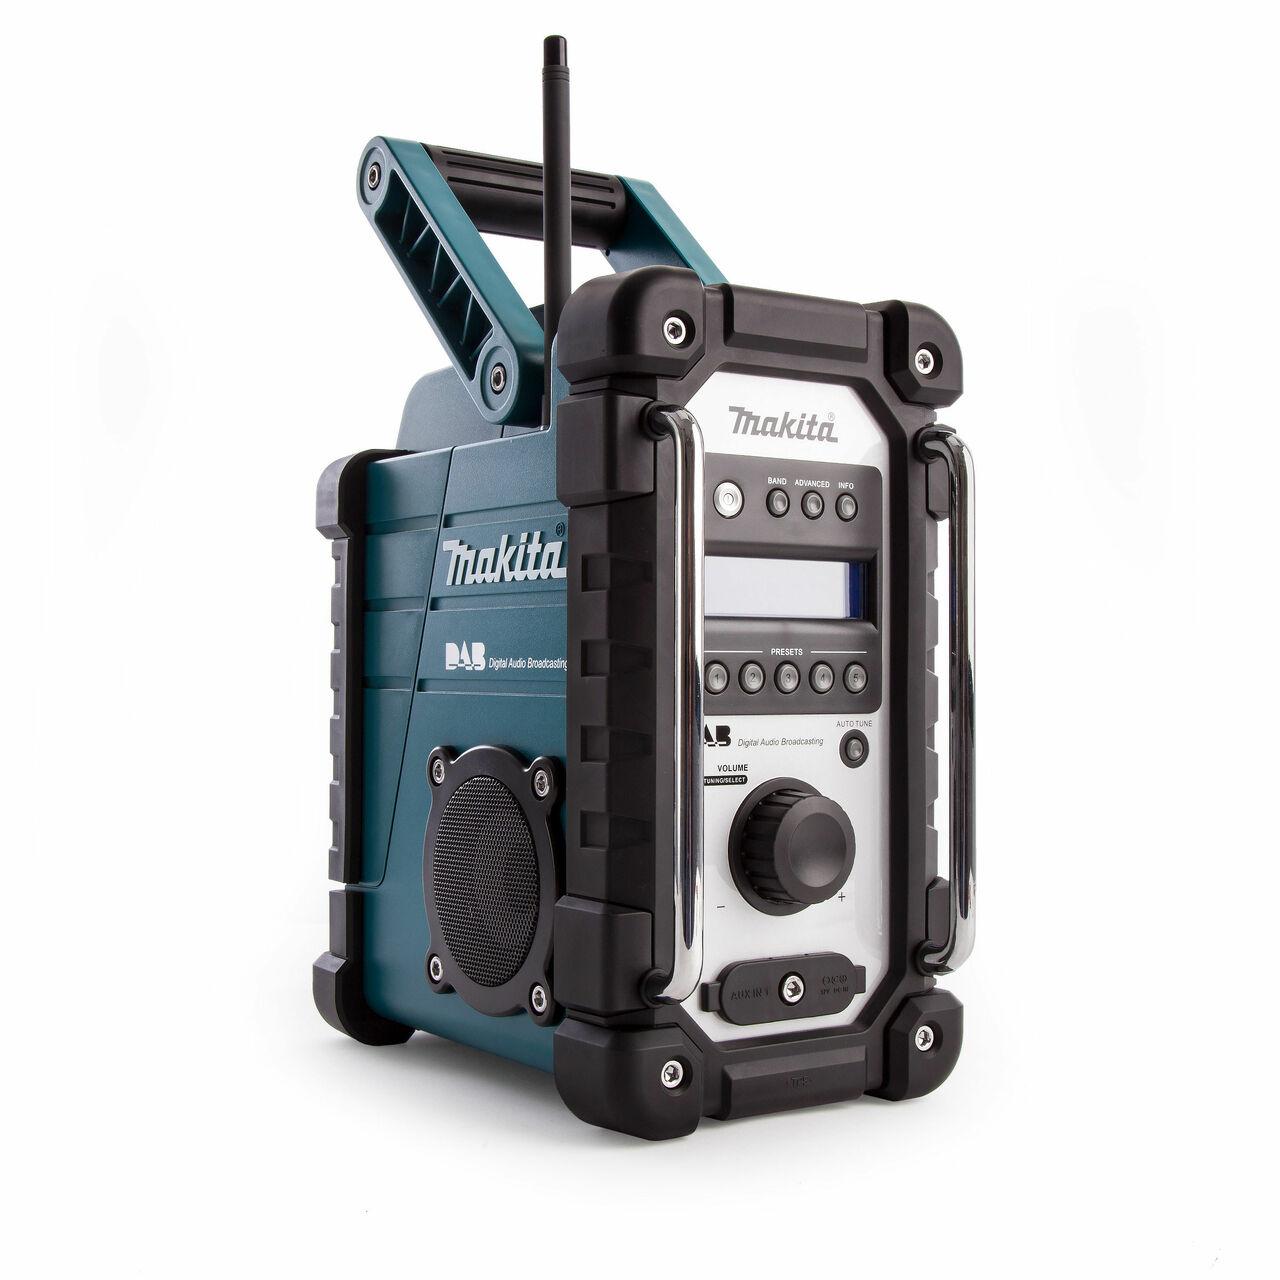 Makita Dab Site Radio MAKDMR109 | NIP64 rated dust and shower-proof construction | toolforce.ie